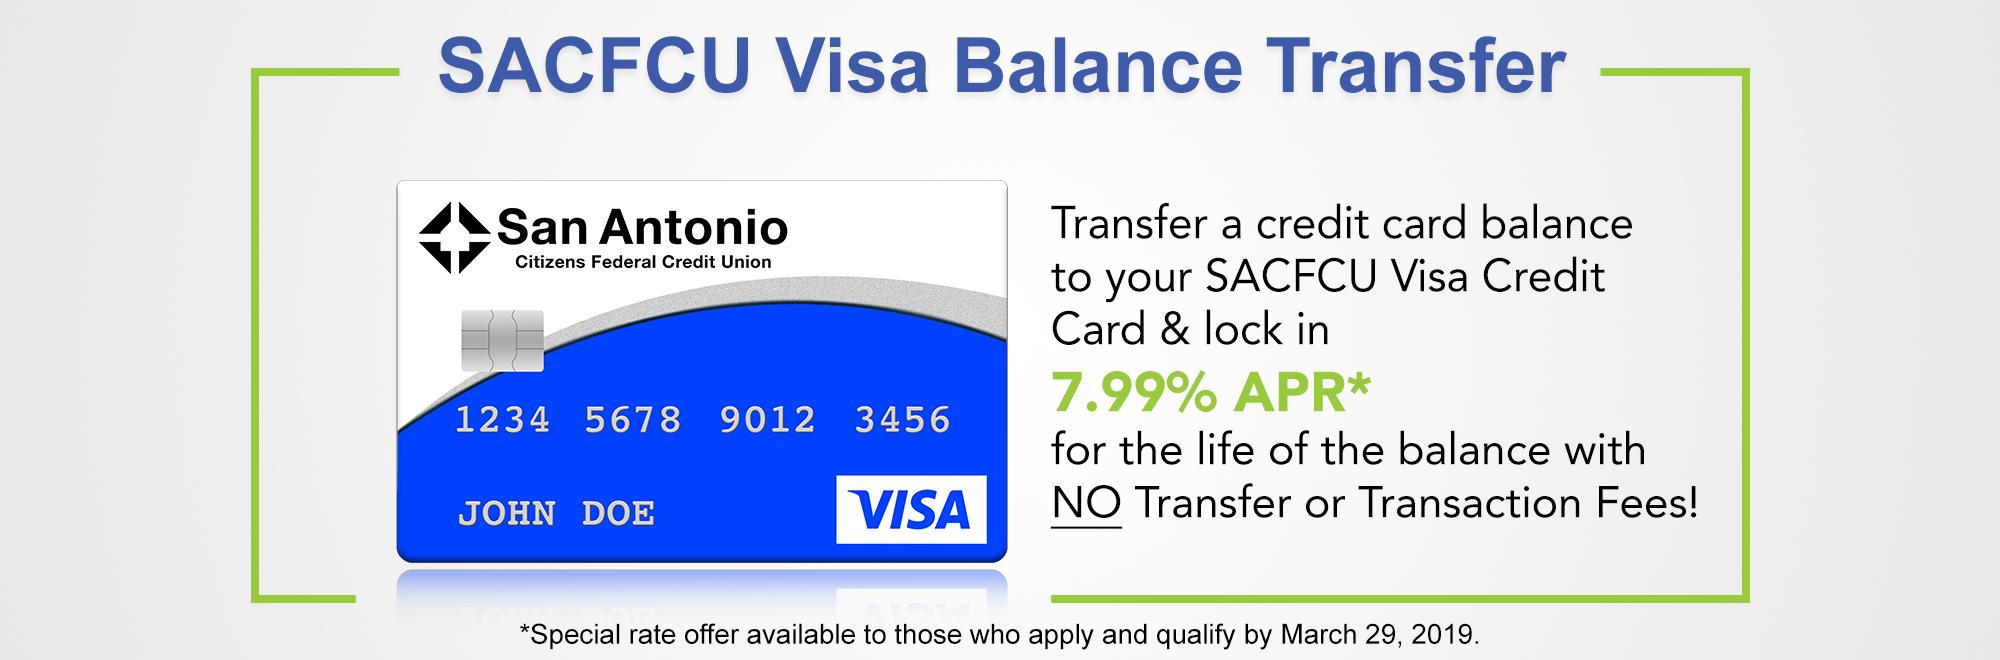 2019 Visa Balance Transfer Image